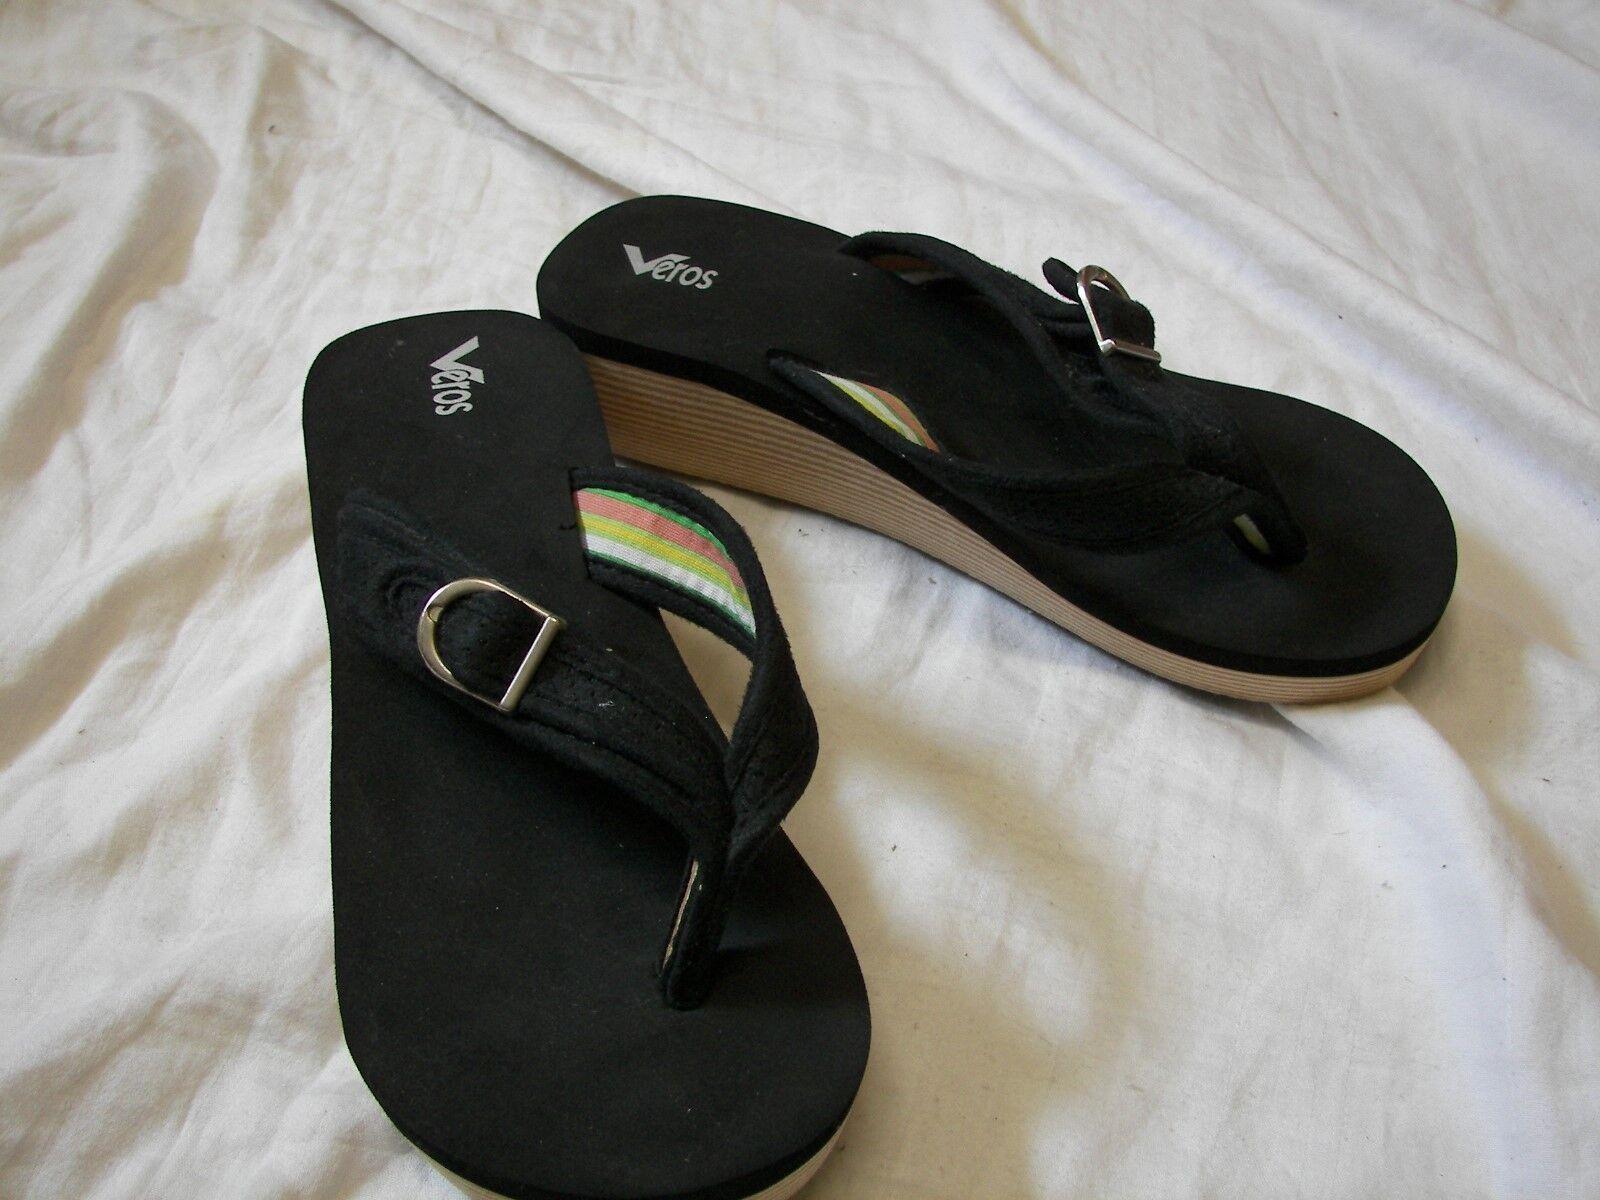 Women's Veros 6.5 Flip Flop Sandals - 6.5 Veros 2b6ca3